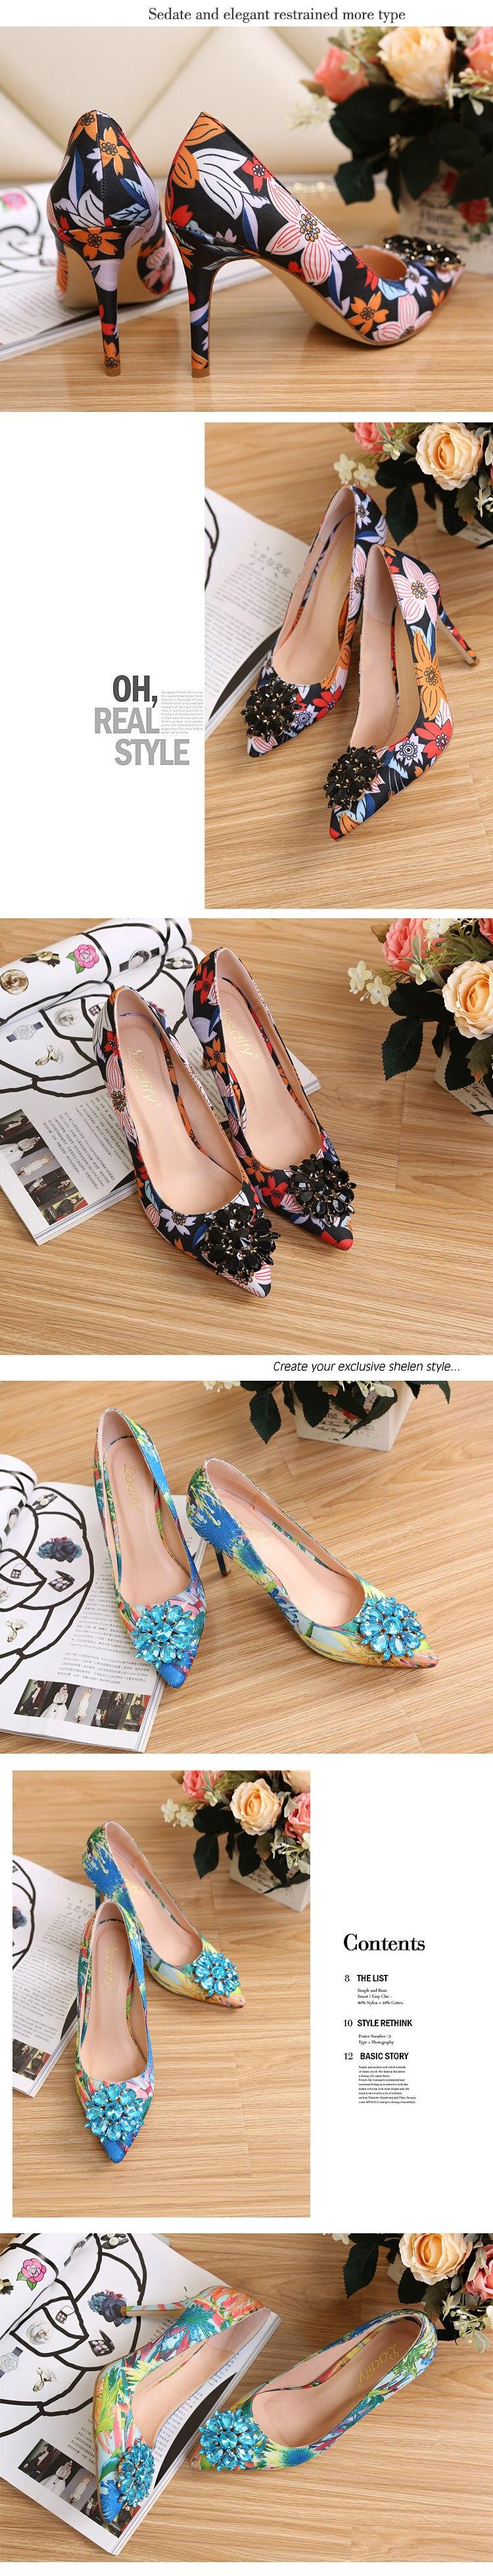 2017 Spring Fashion Pointed Women Pumps Rhinestone Thin High-heeled Women Shoes Black Pink High Heels Single Wedding Shoes XP35 4